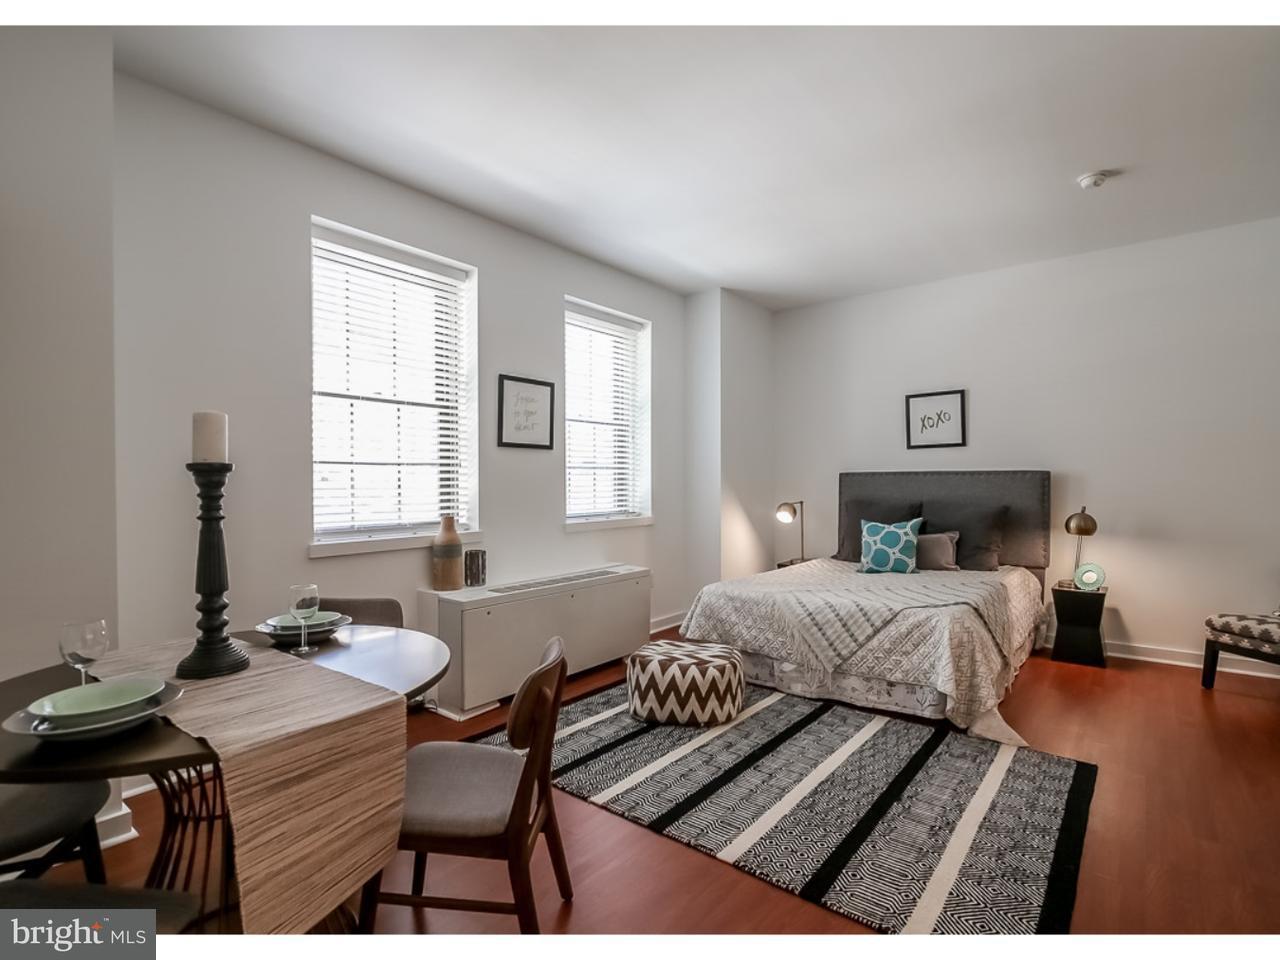 Single Family Home for Sale at 219 S 18TH ST #502 Philadelphia, Pennsylvania 19103 United States